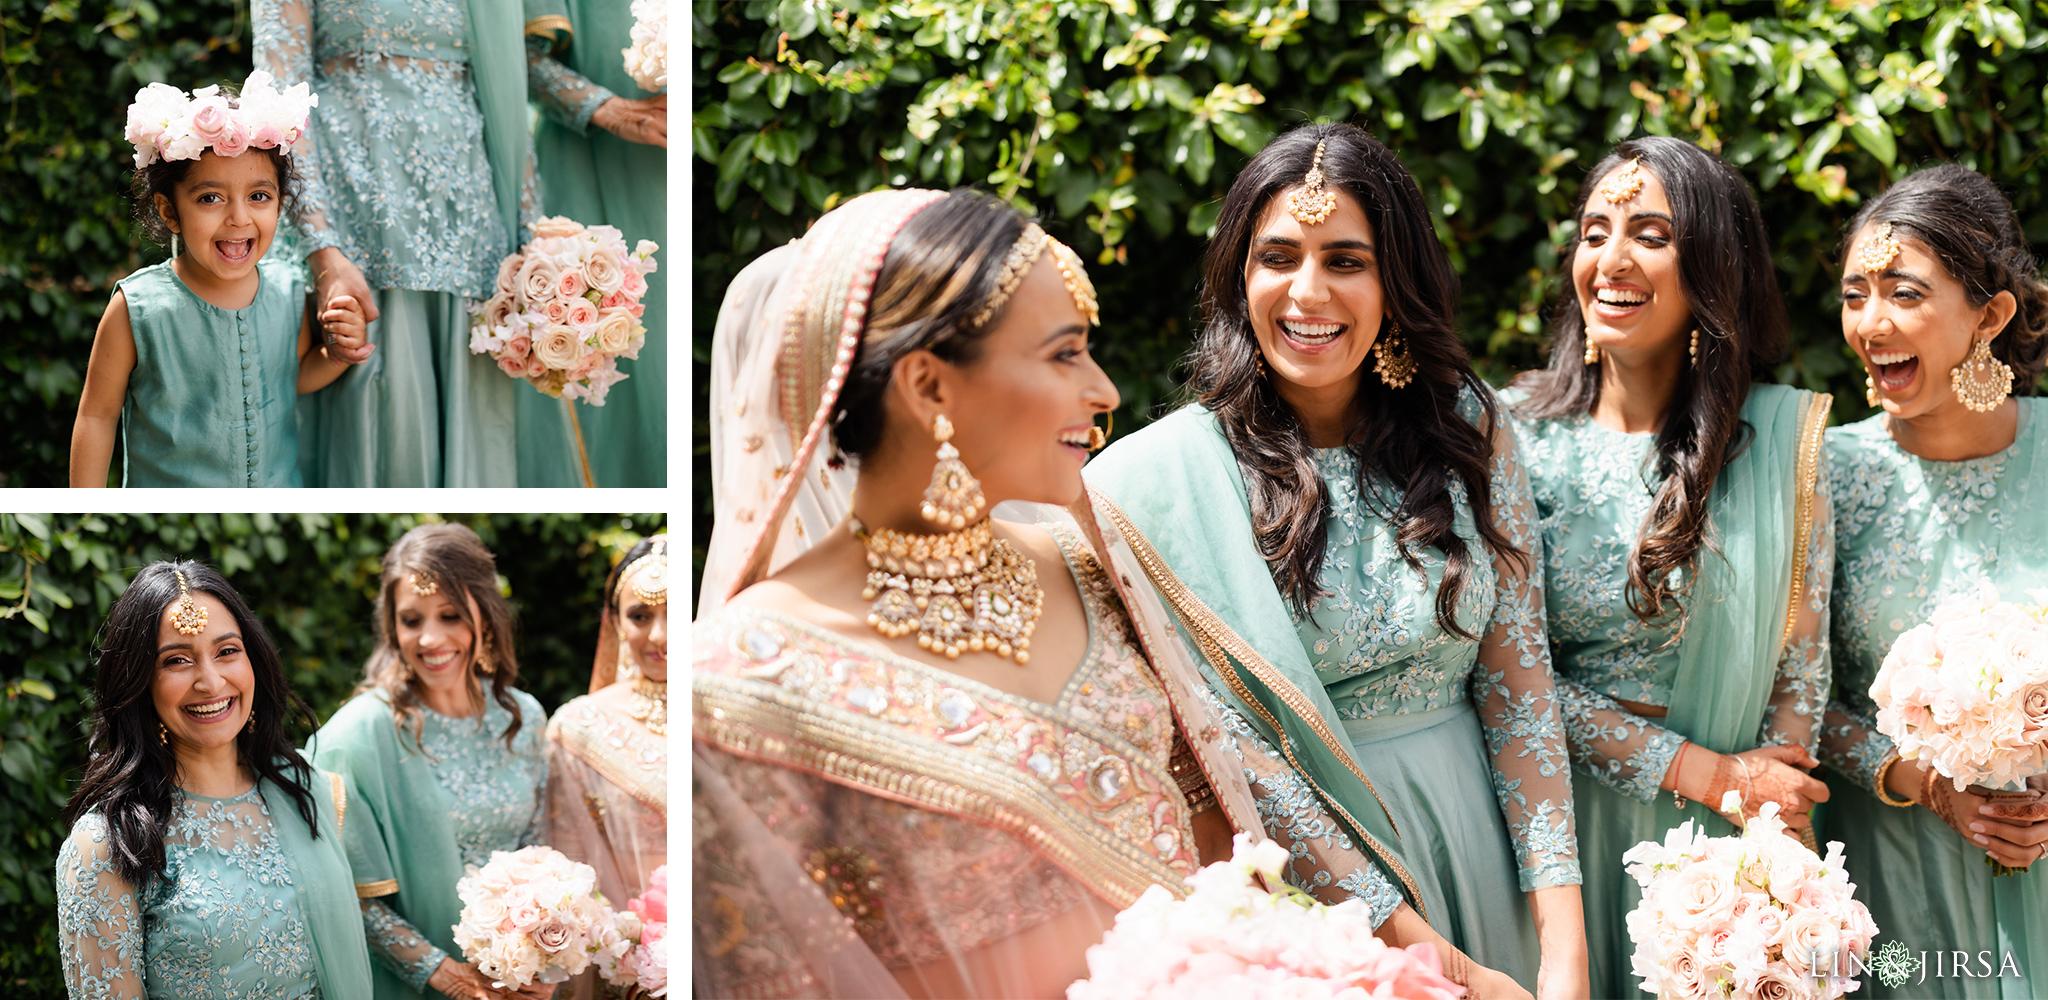 10 Hilton Santa Barbara Beachfront Resort Punjabi Indian Wedding Ceremony Photography